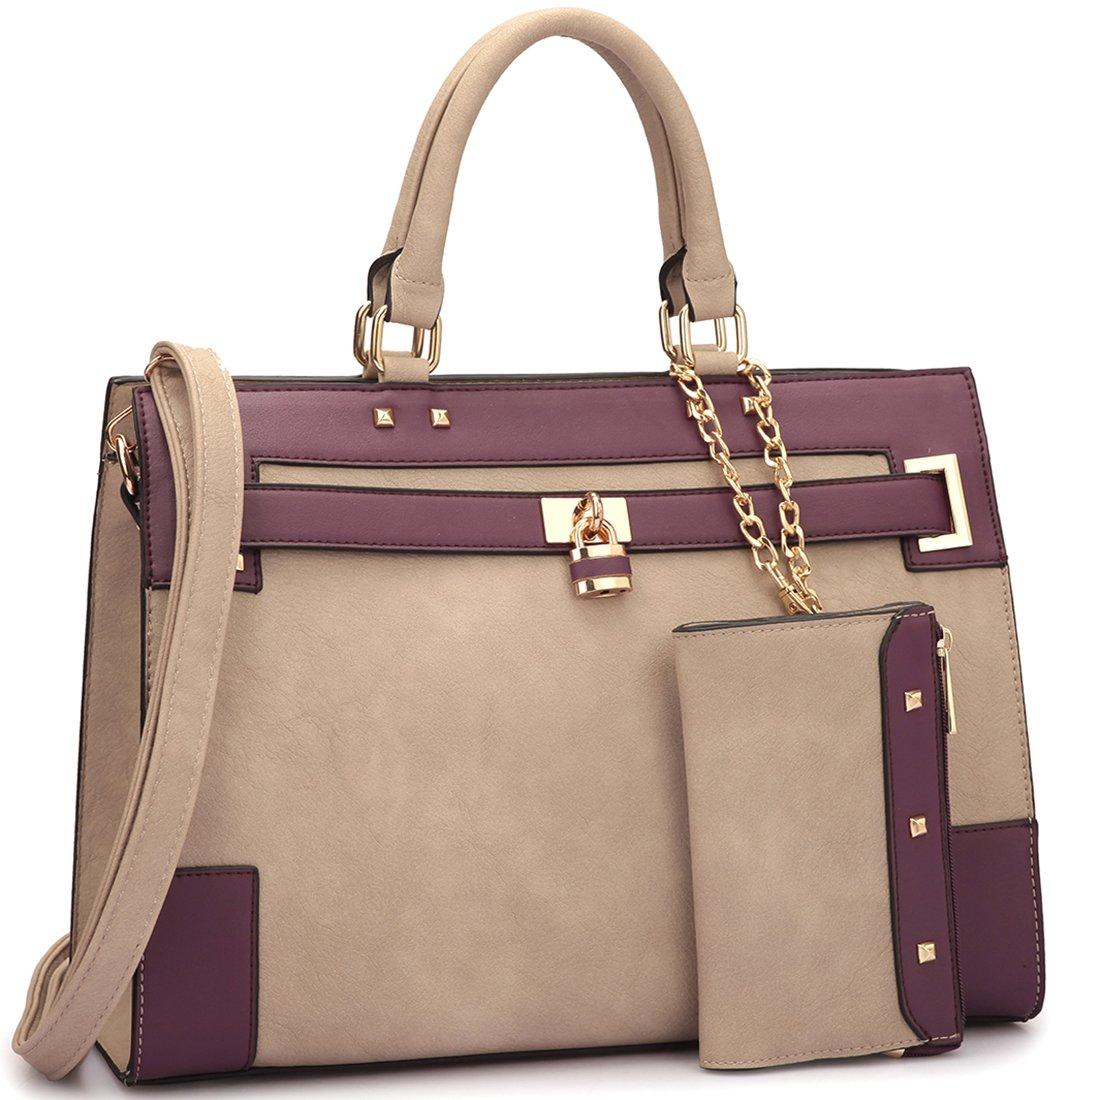 34ba69fedf Details about Women s Two Tone Fashion Handbag For Women Top Handle Satchel  Bag Padlock Design